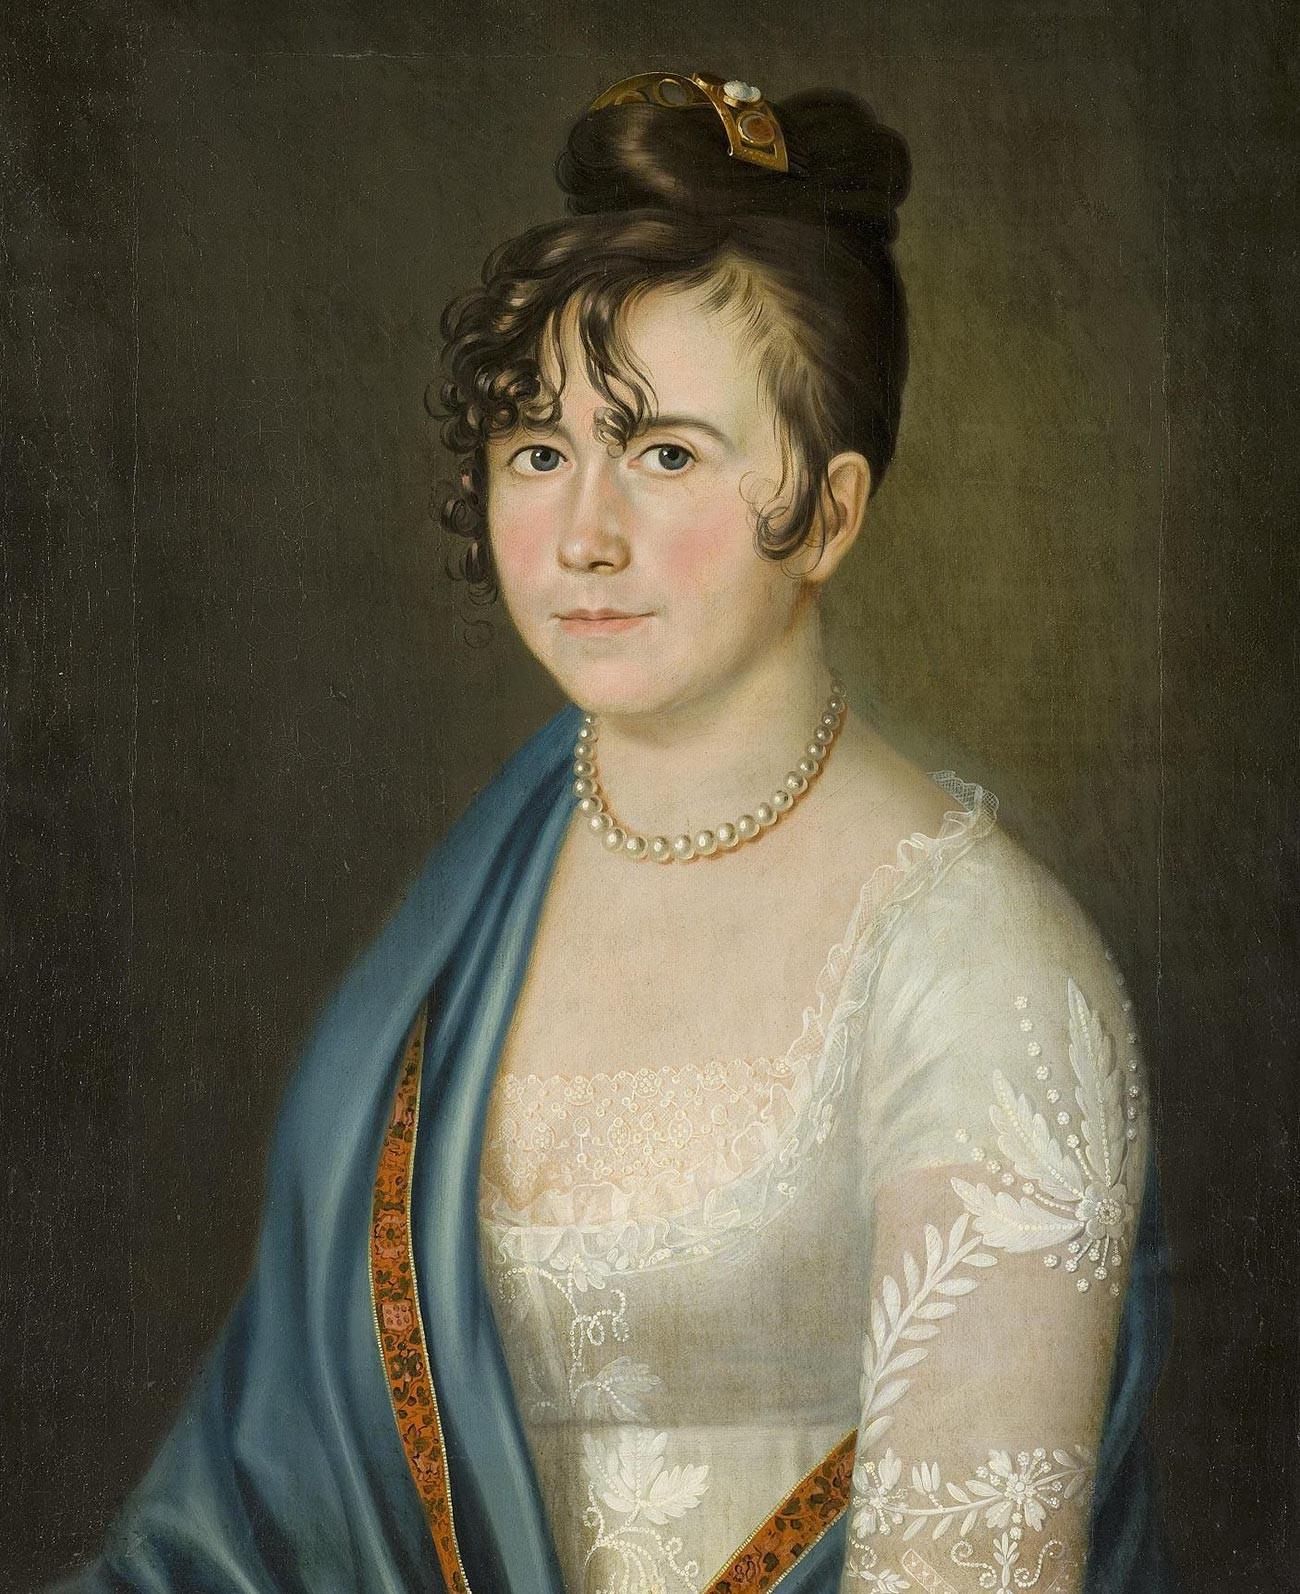 Anna Bobrinskaya (1769–1846), neé Anna Ungern-Sternberg, Alexey Bobrinsky's wife